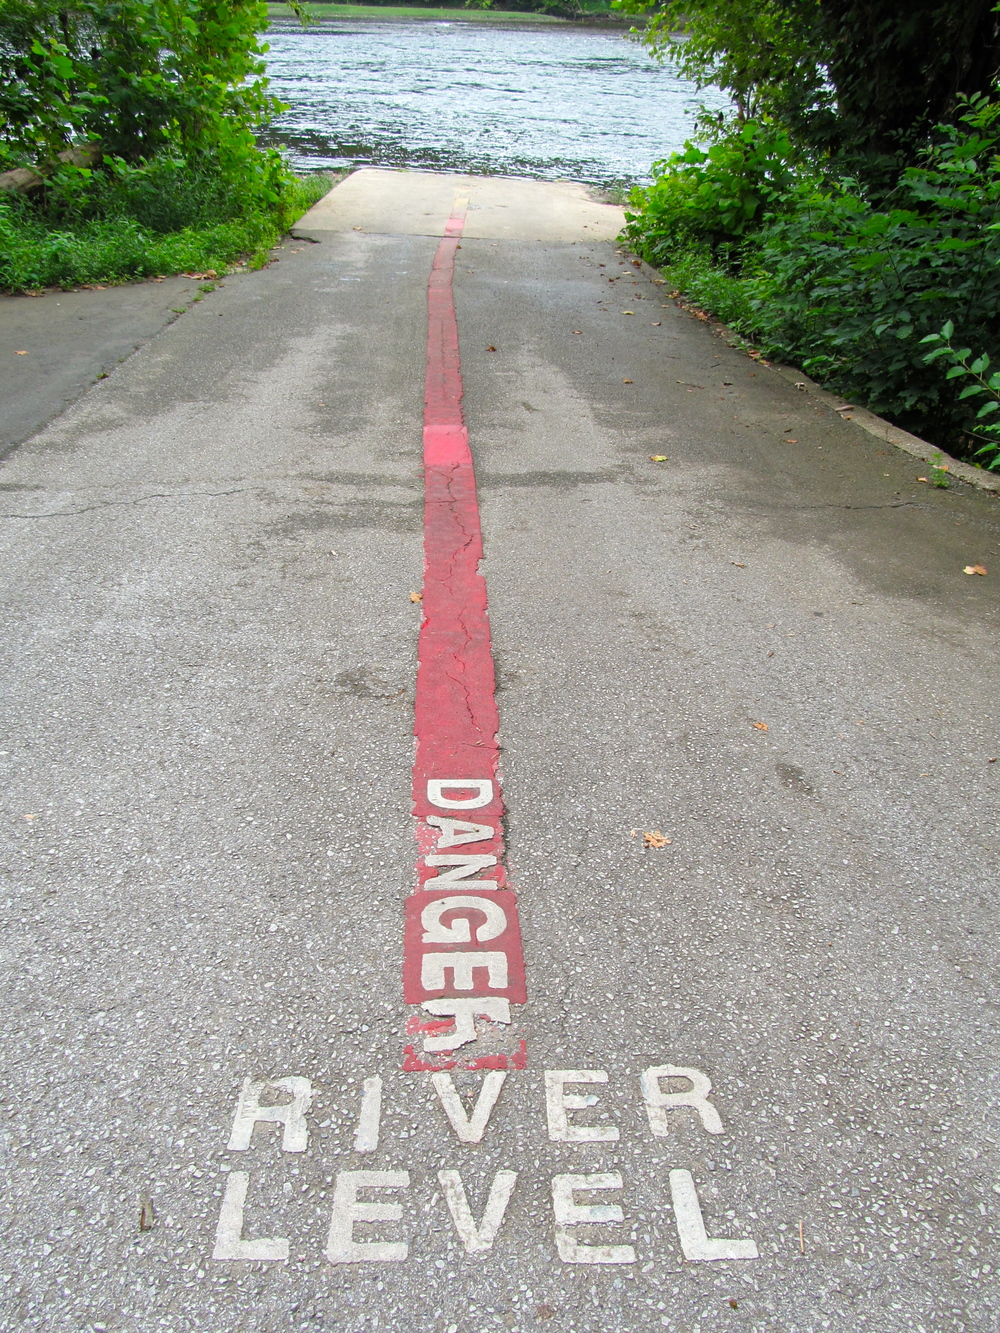 Potomac River gauge at Taylor's Landing Photo: Alan Leslie, University of Maryland